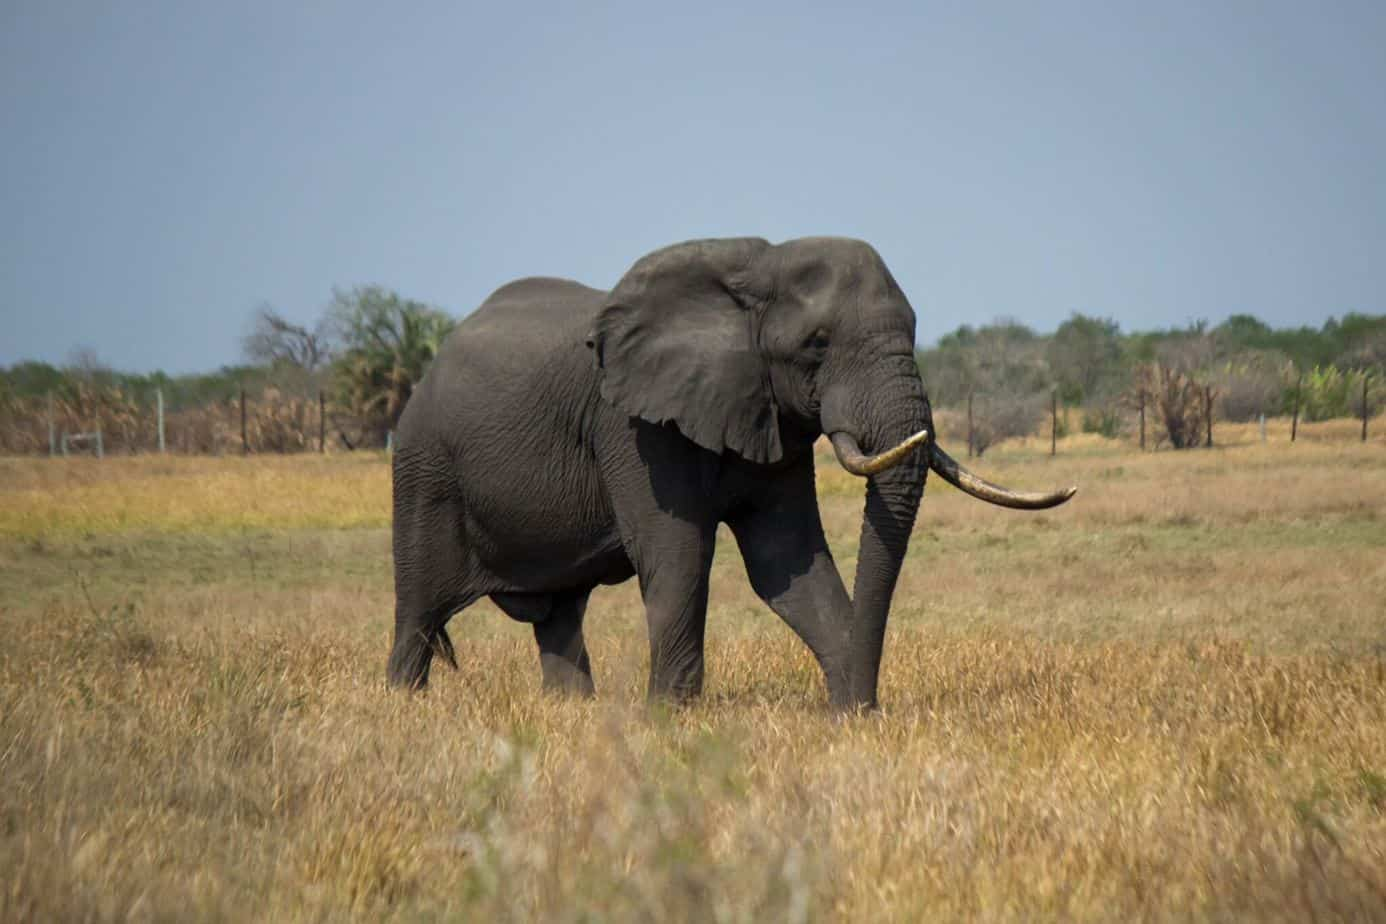 African Savannah Elephant @ Tembe Elephant Park. Photo: Håvard Rosenlund